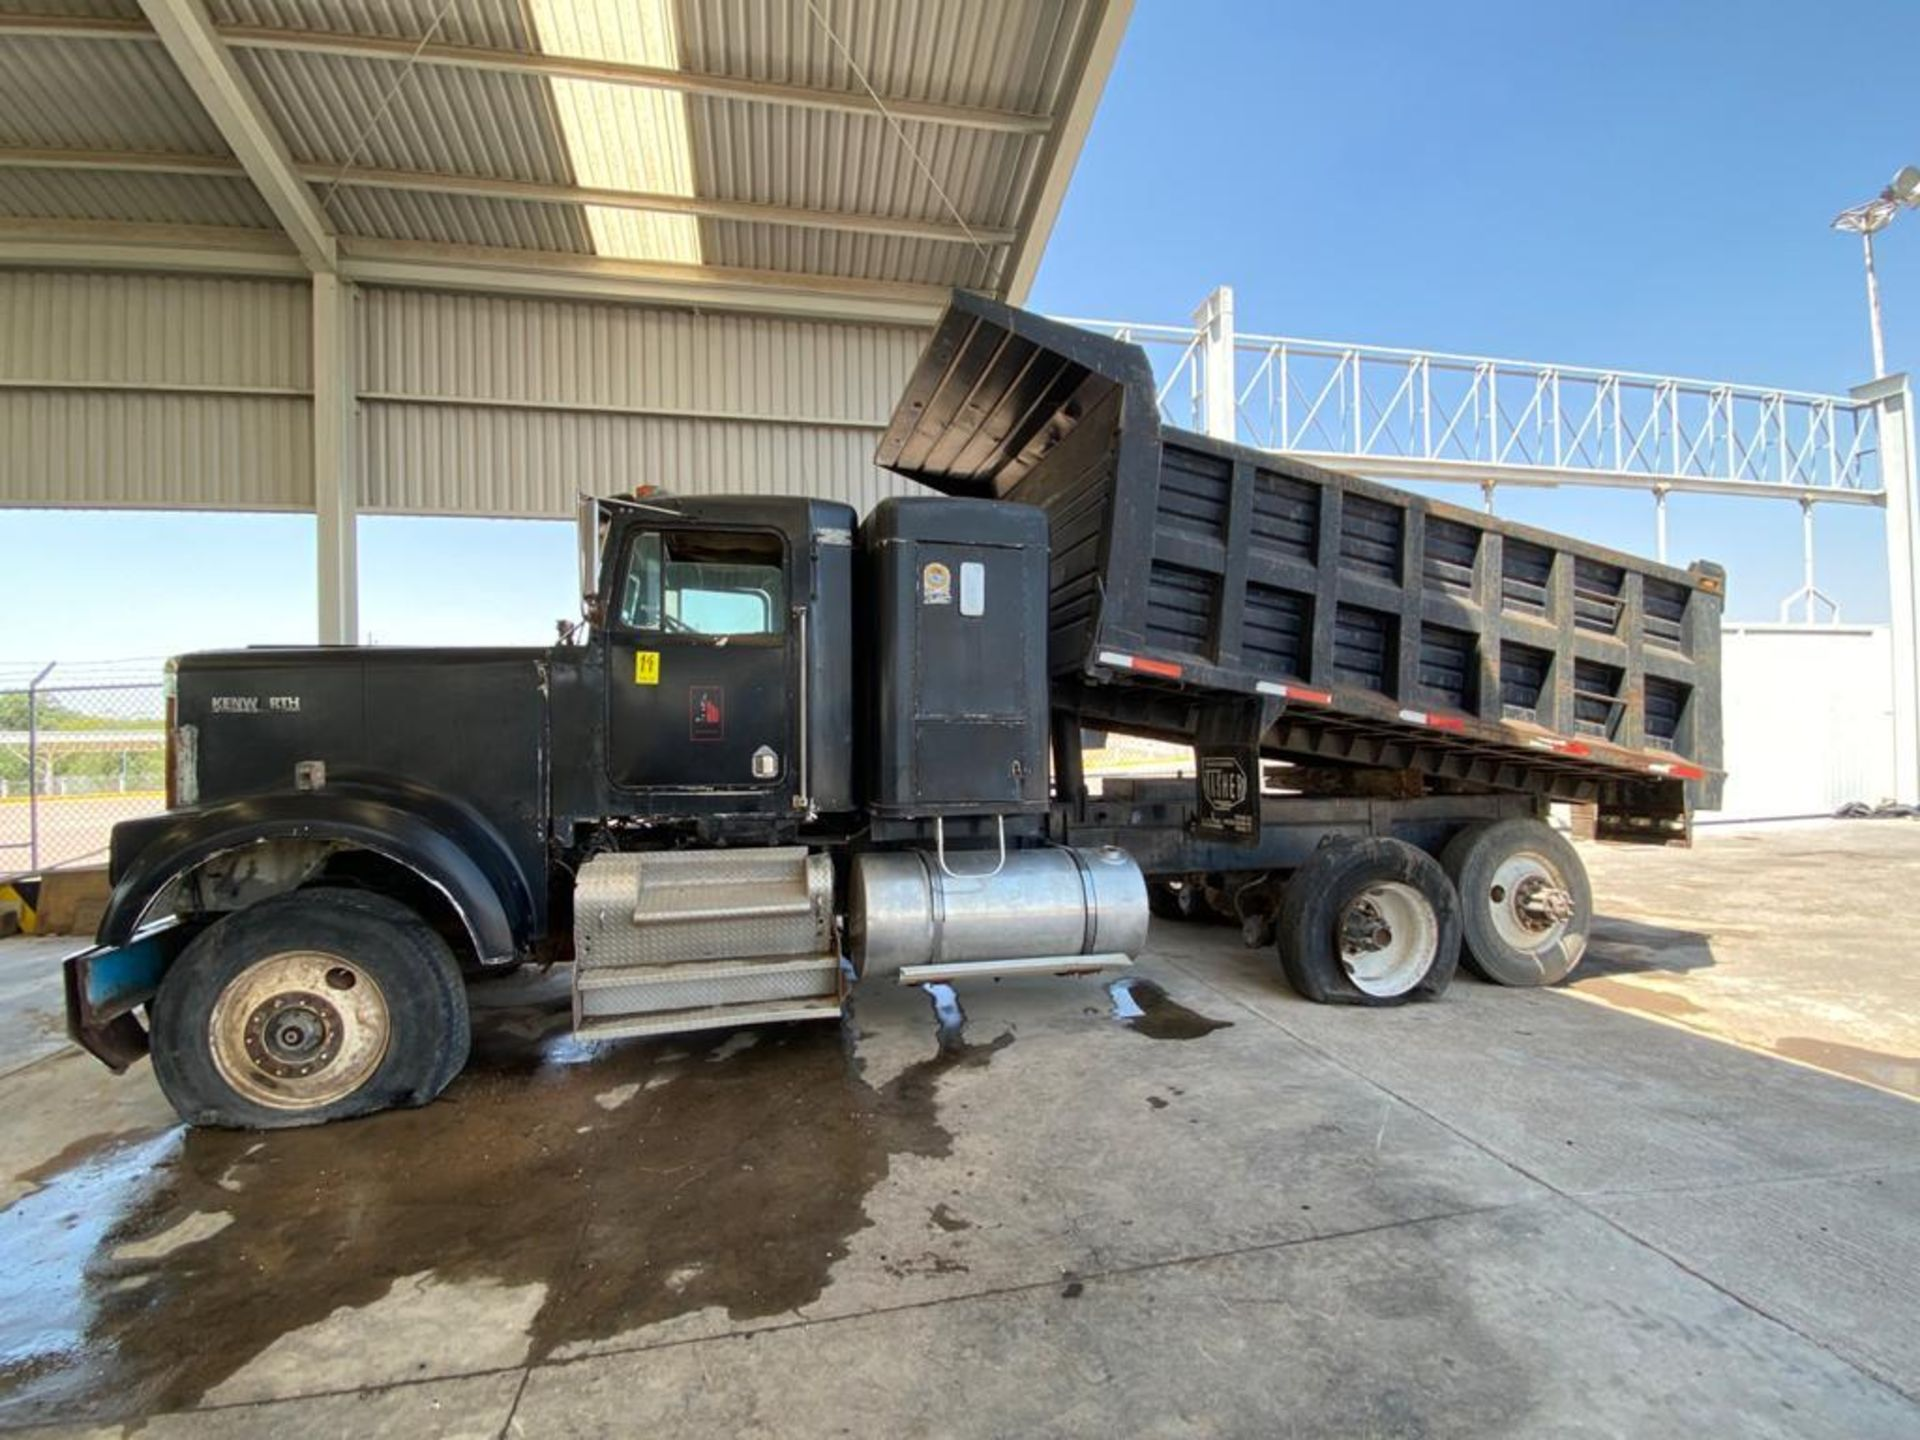 1983 Kenworth Dump Truck, standard transmission of 10 speeds, with Cummins motor - Image 8 of 68